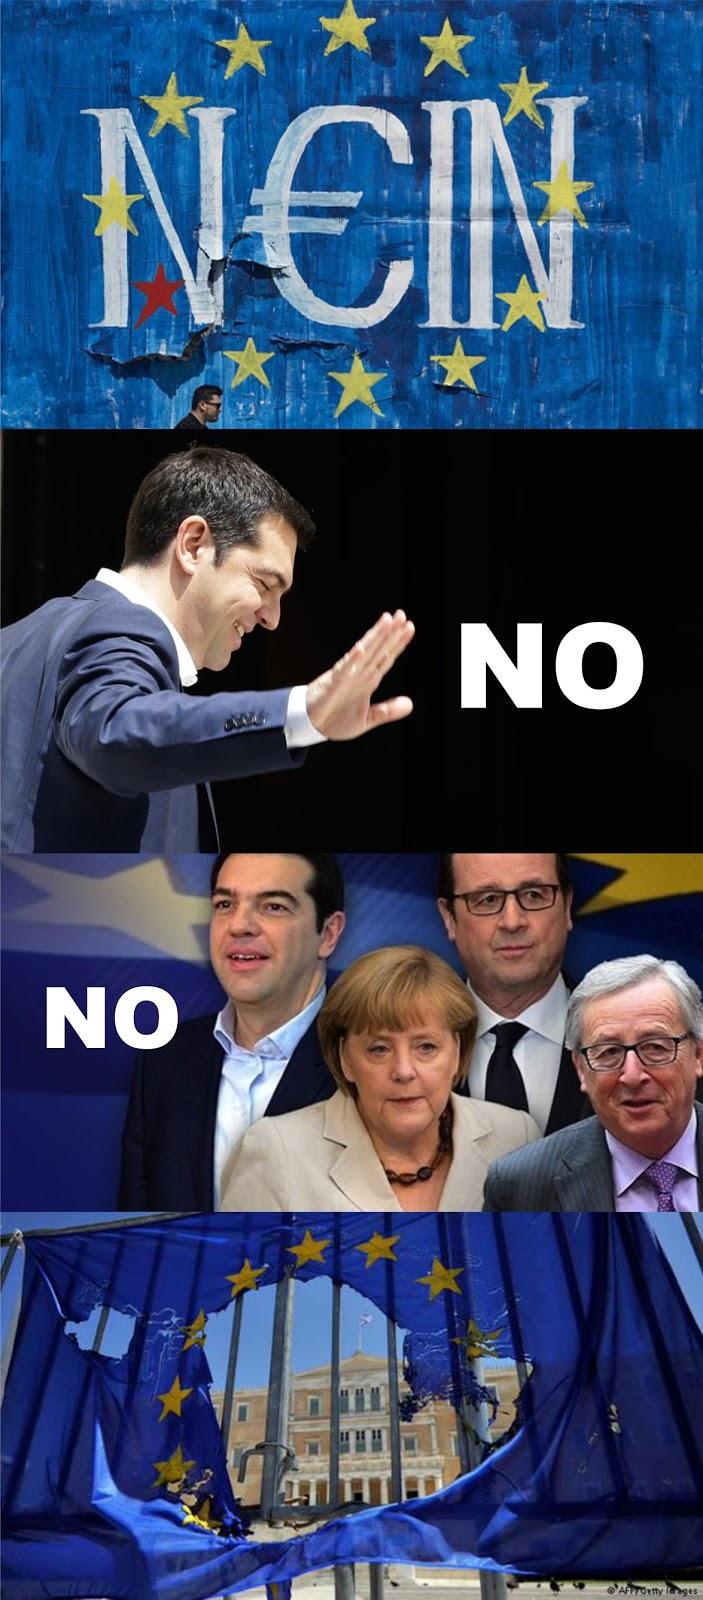 http://3.bp.blogspot.com/-l2I9rtDGiYw/VZAXoqOokOI/AAAAAAAAHf4/wput3gH_eIw/s1600/Greece%2Breferendum.%2BNo.%2BYanis%2BVaroufakis.%2B%25231ab.jpg?SSImageQuality=Full